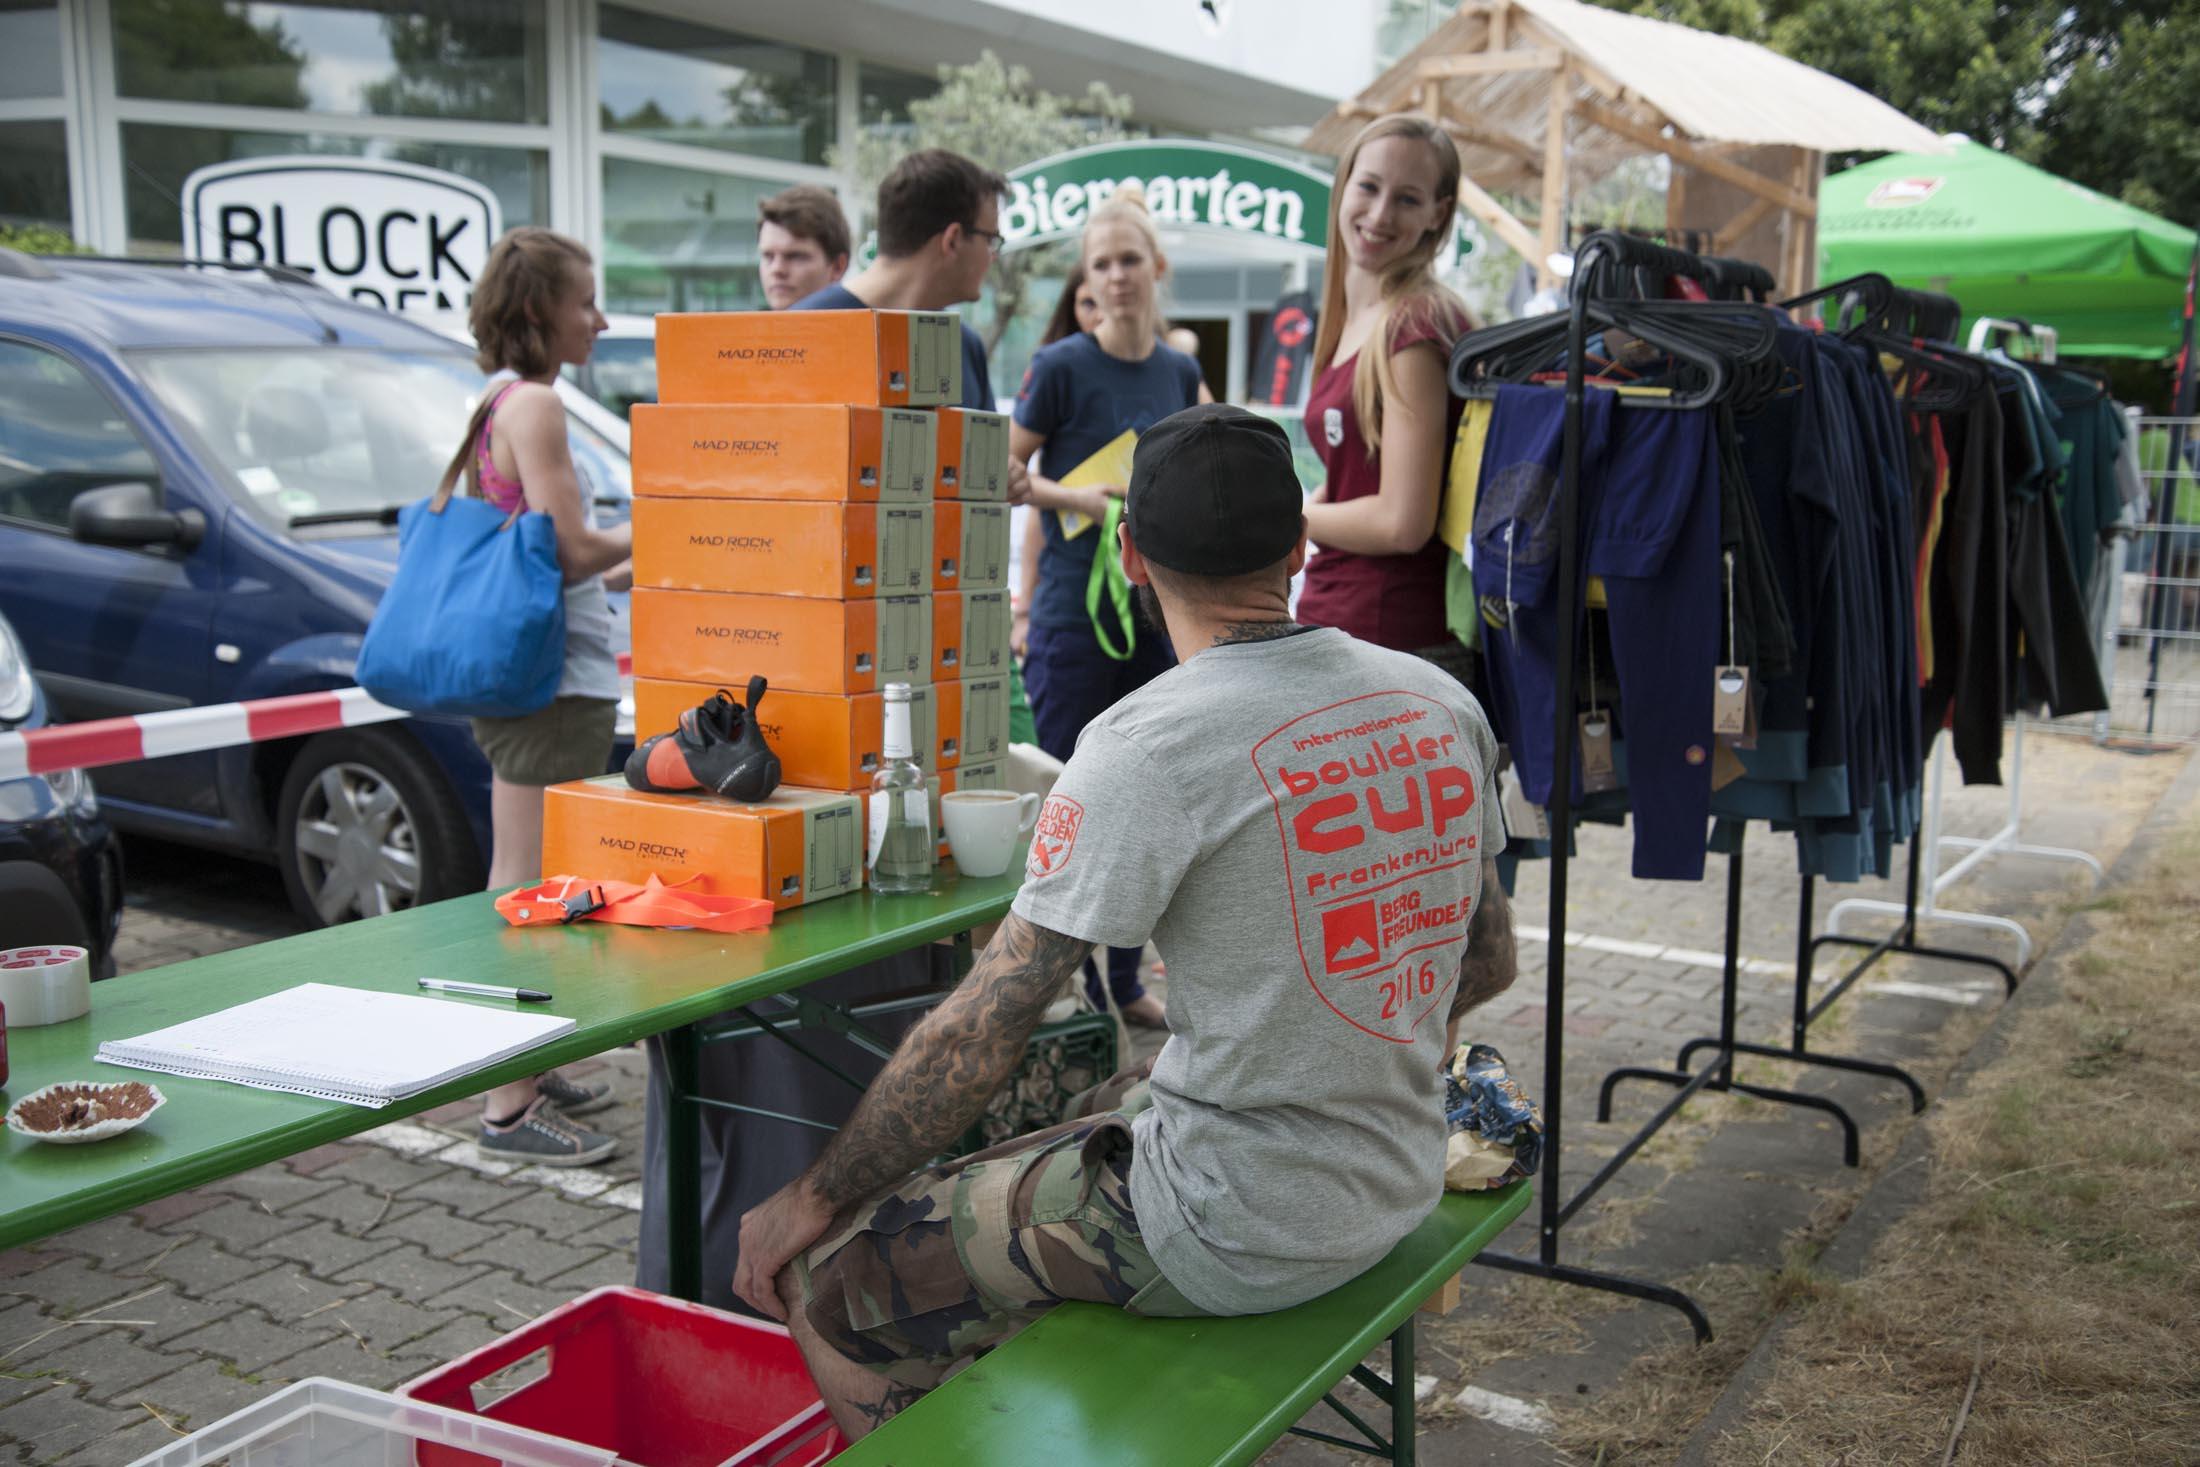 Registration internationaler bouldercup Frankenjura 2016, BLOCKHELDEN Erlangen, Mammut, Bergfreunde.de, Boulderwettkampf07092016071